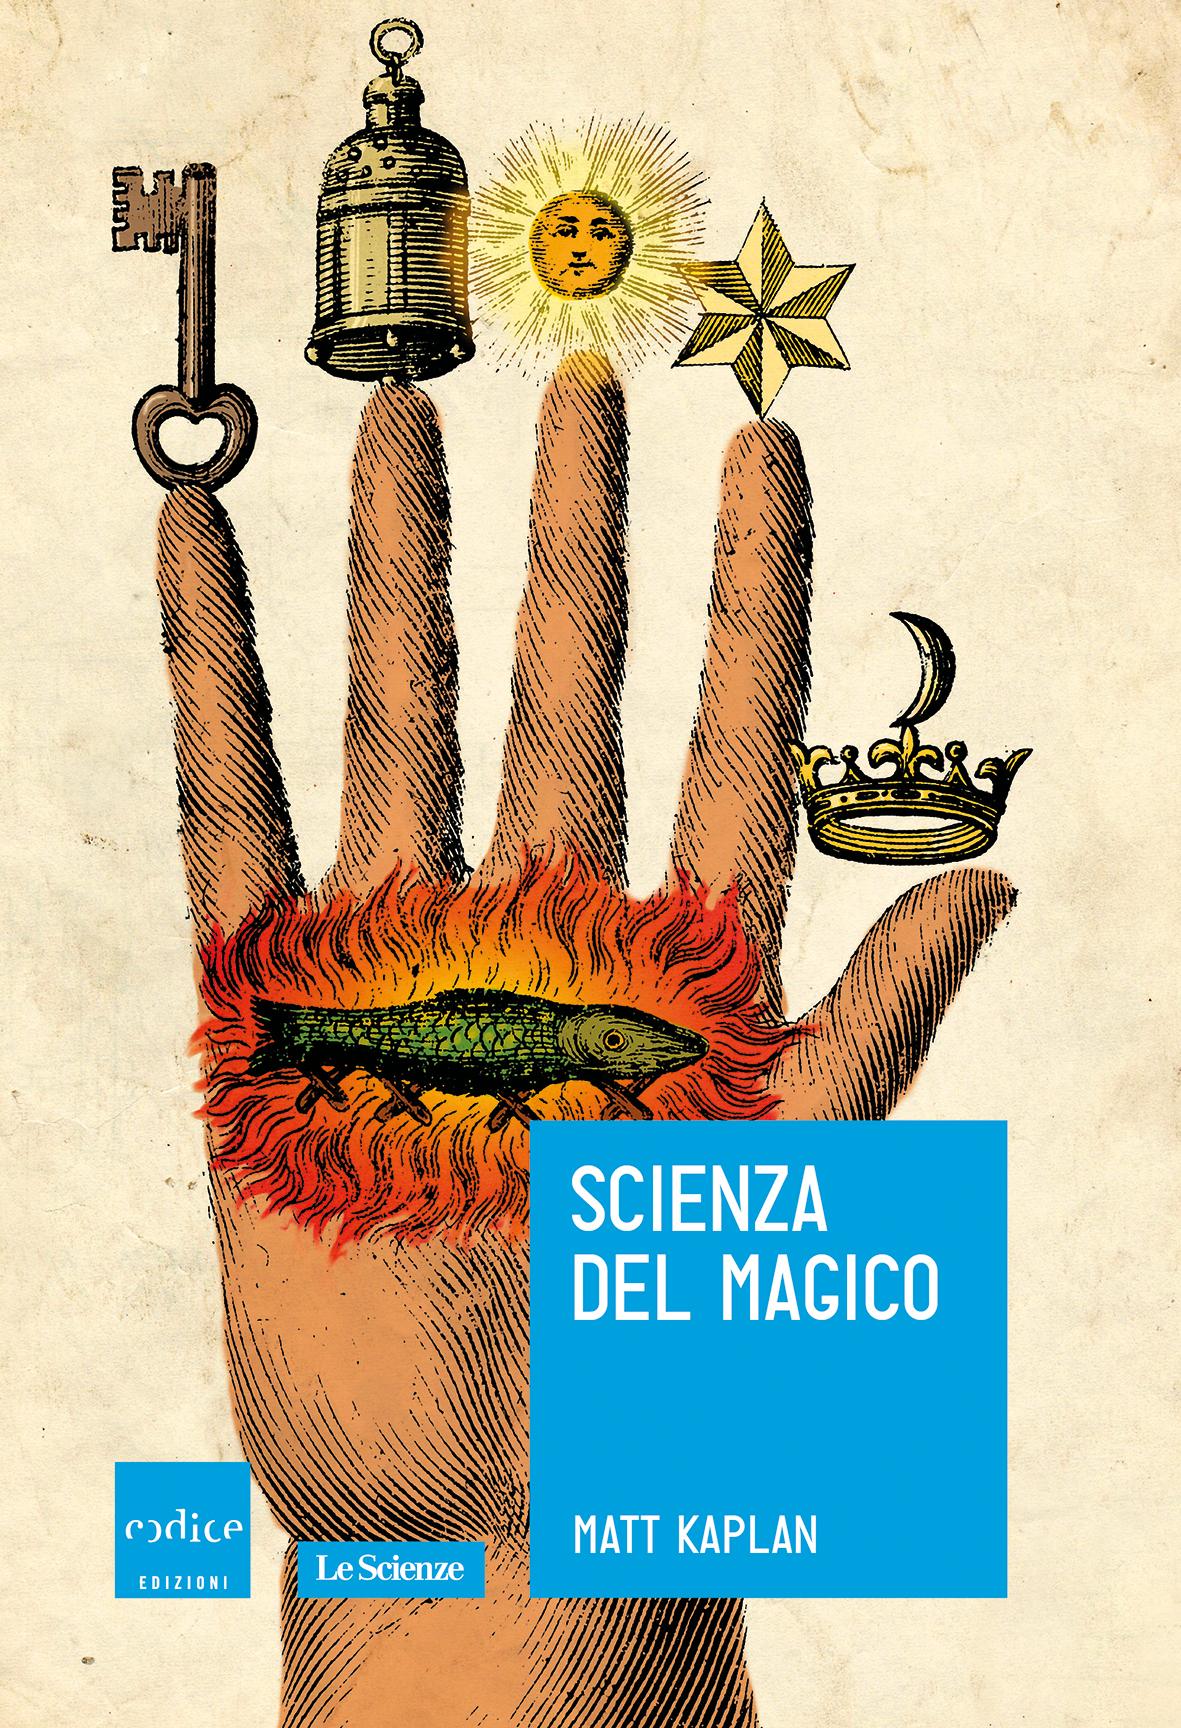 Matt Kaplan: Scienza del magico